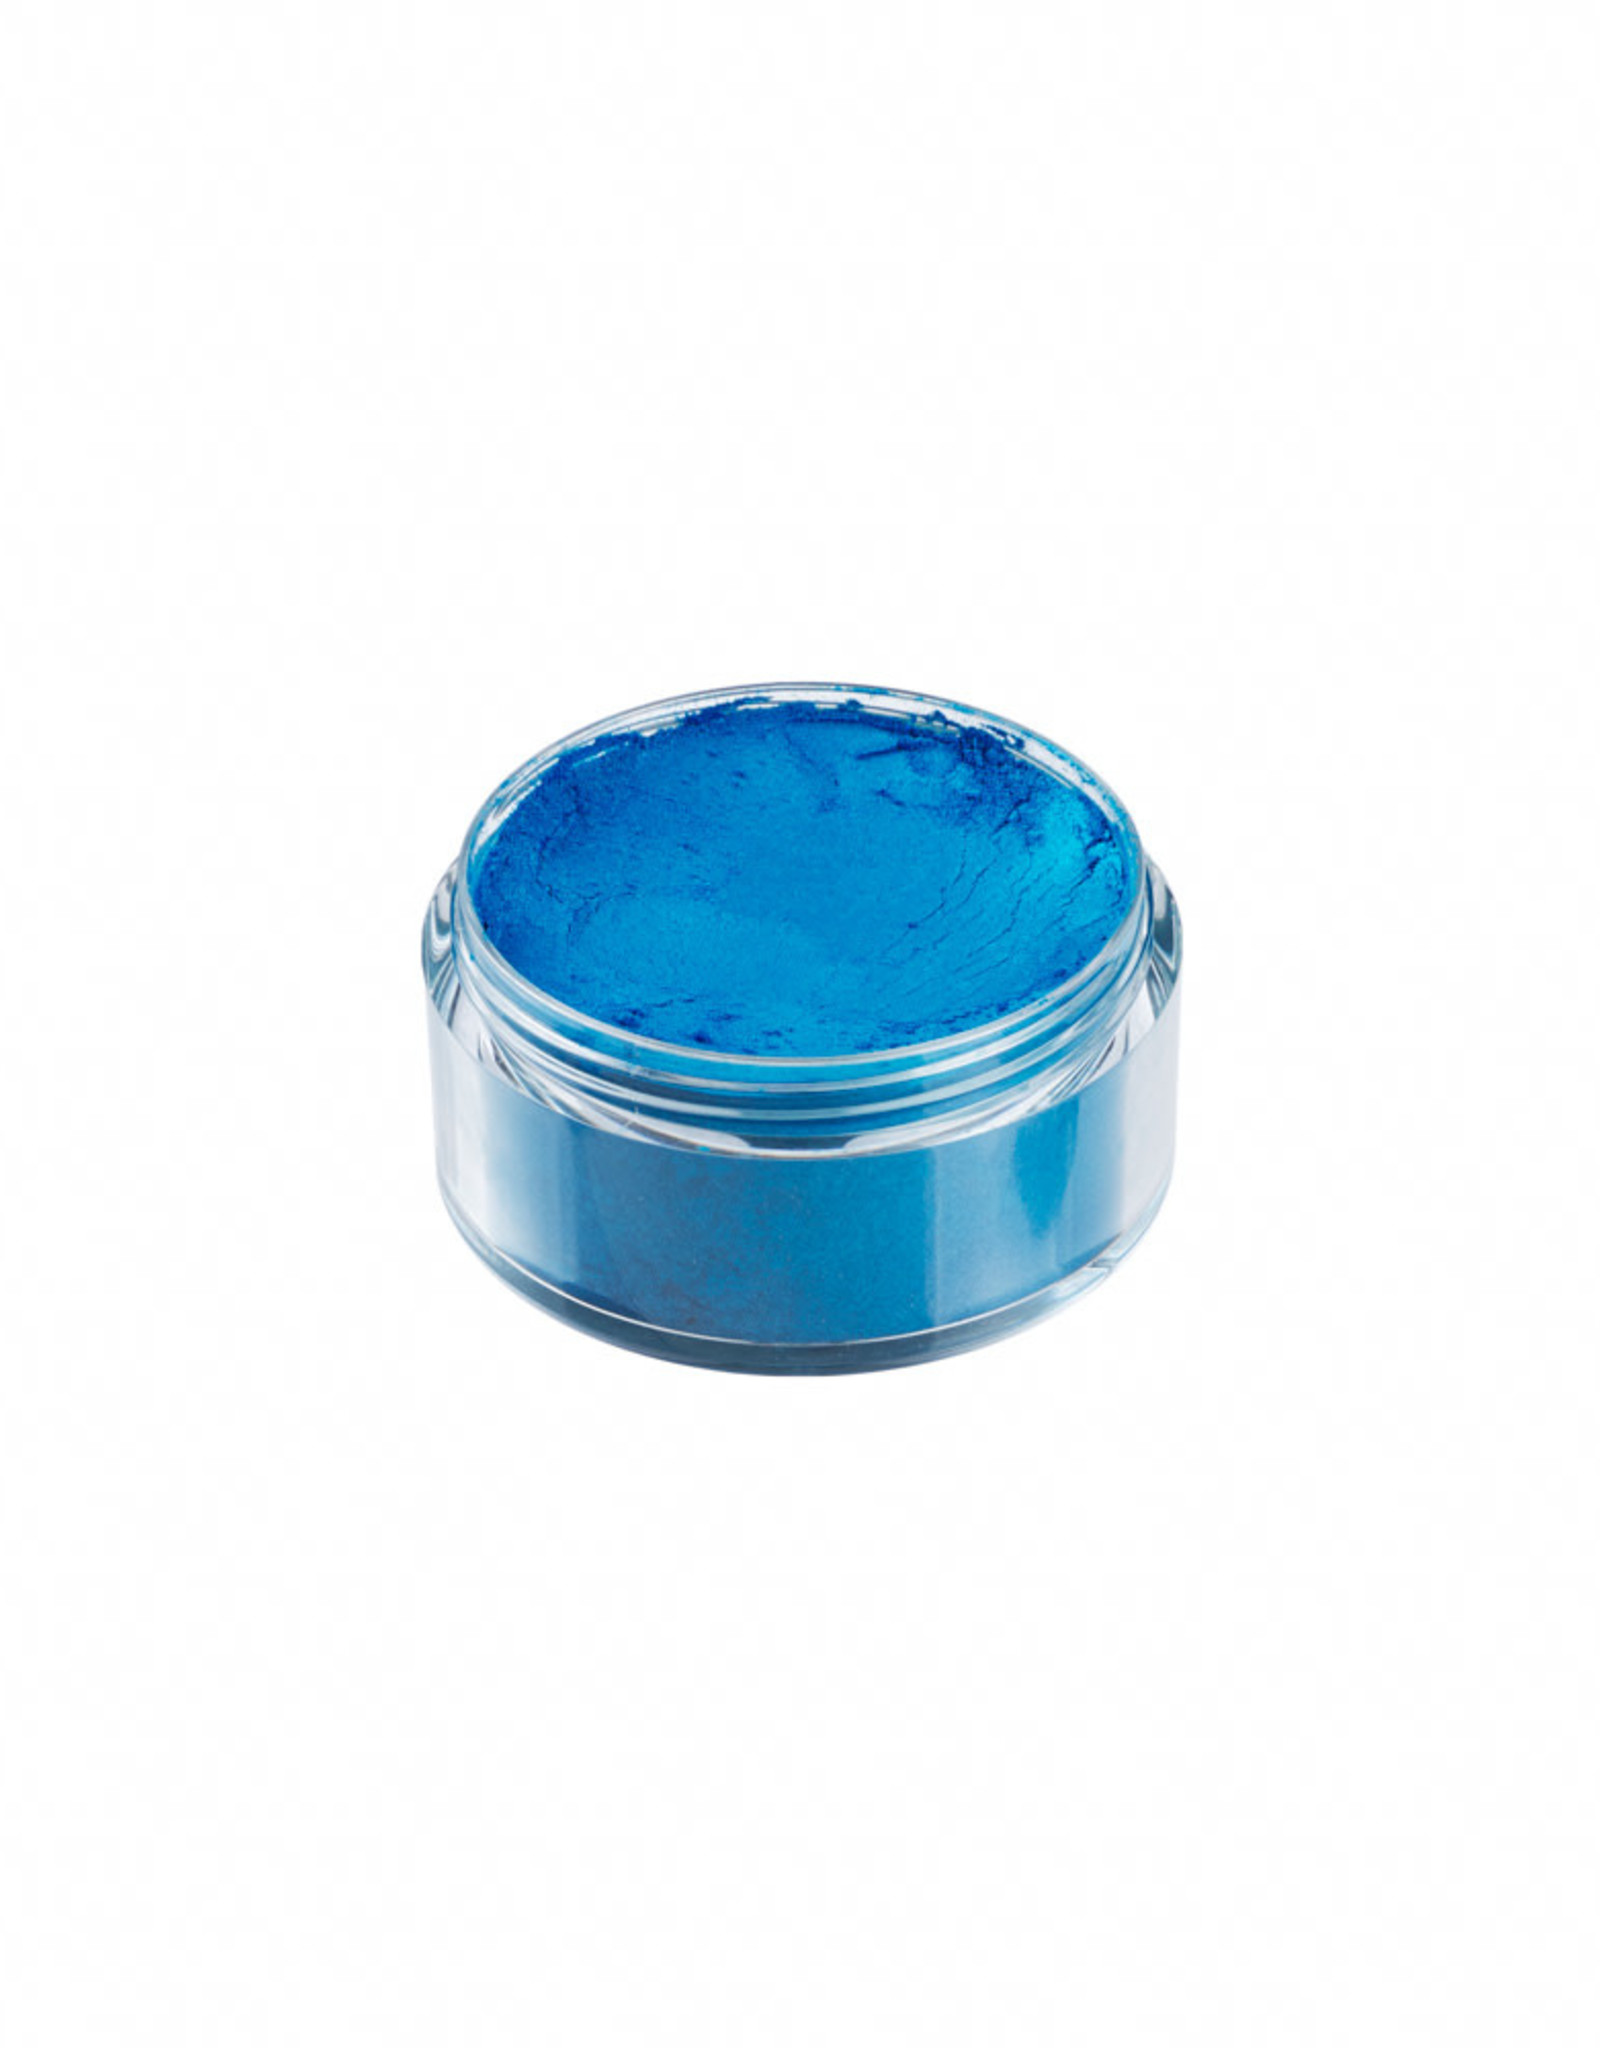 Ben Nye LUMIERE LX PWDR, COSMIC BLUE,.28 OZ